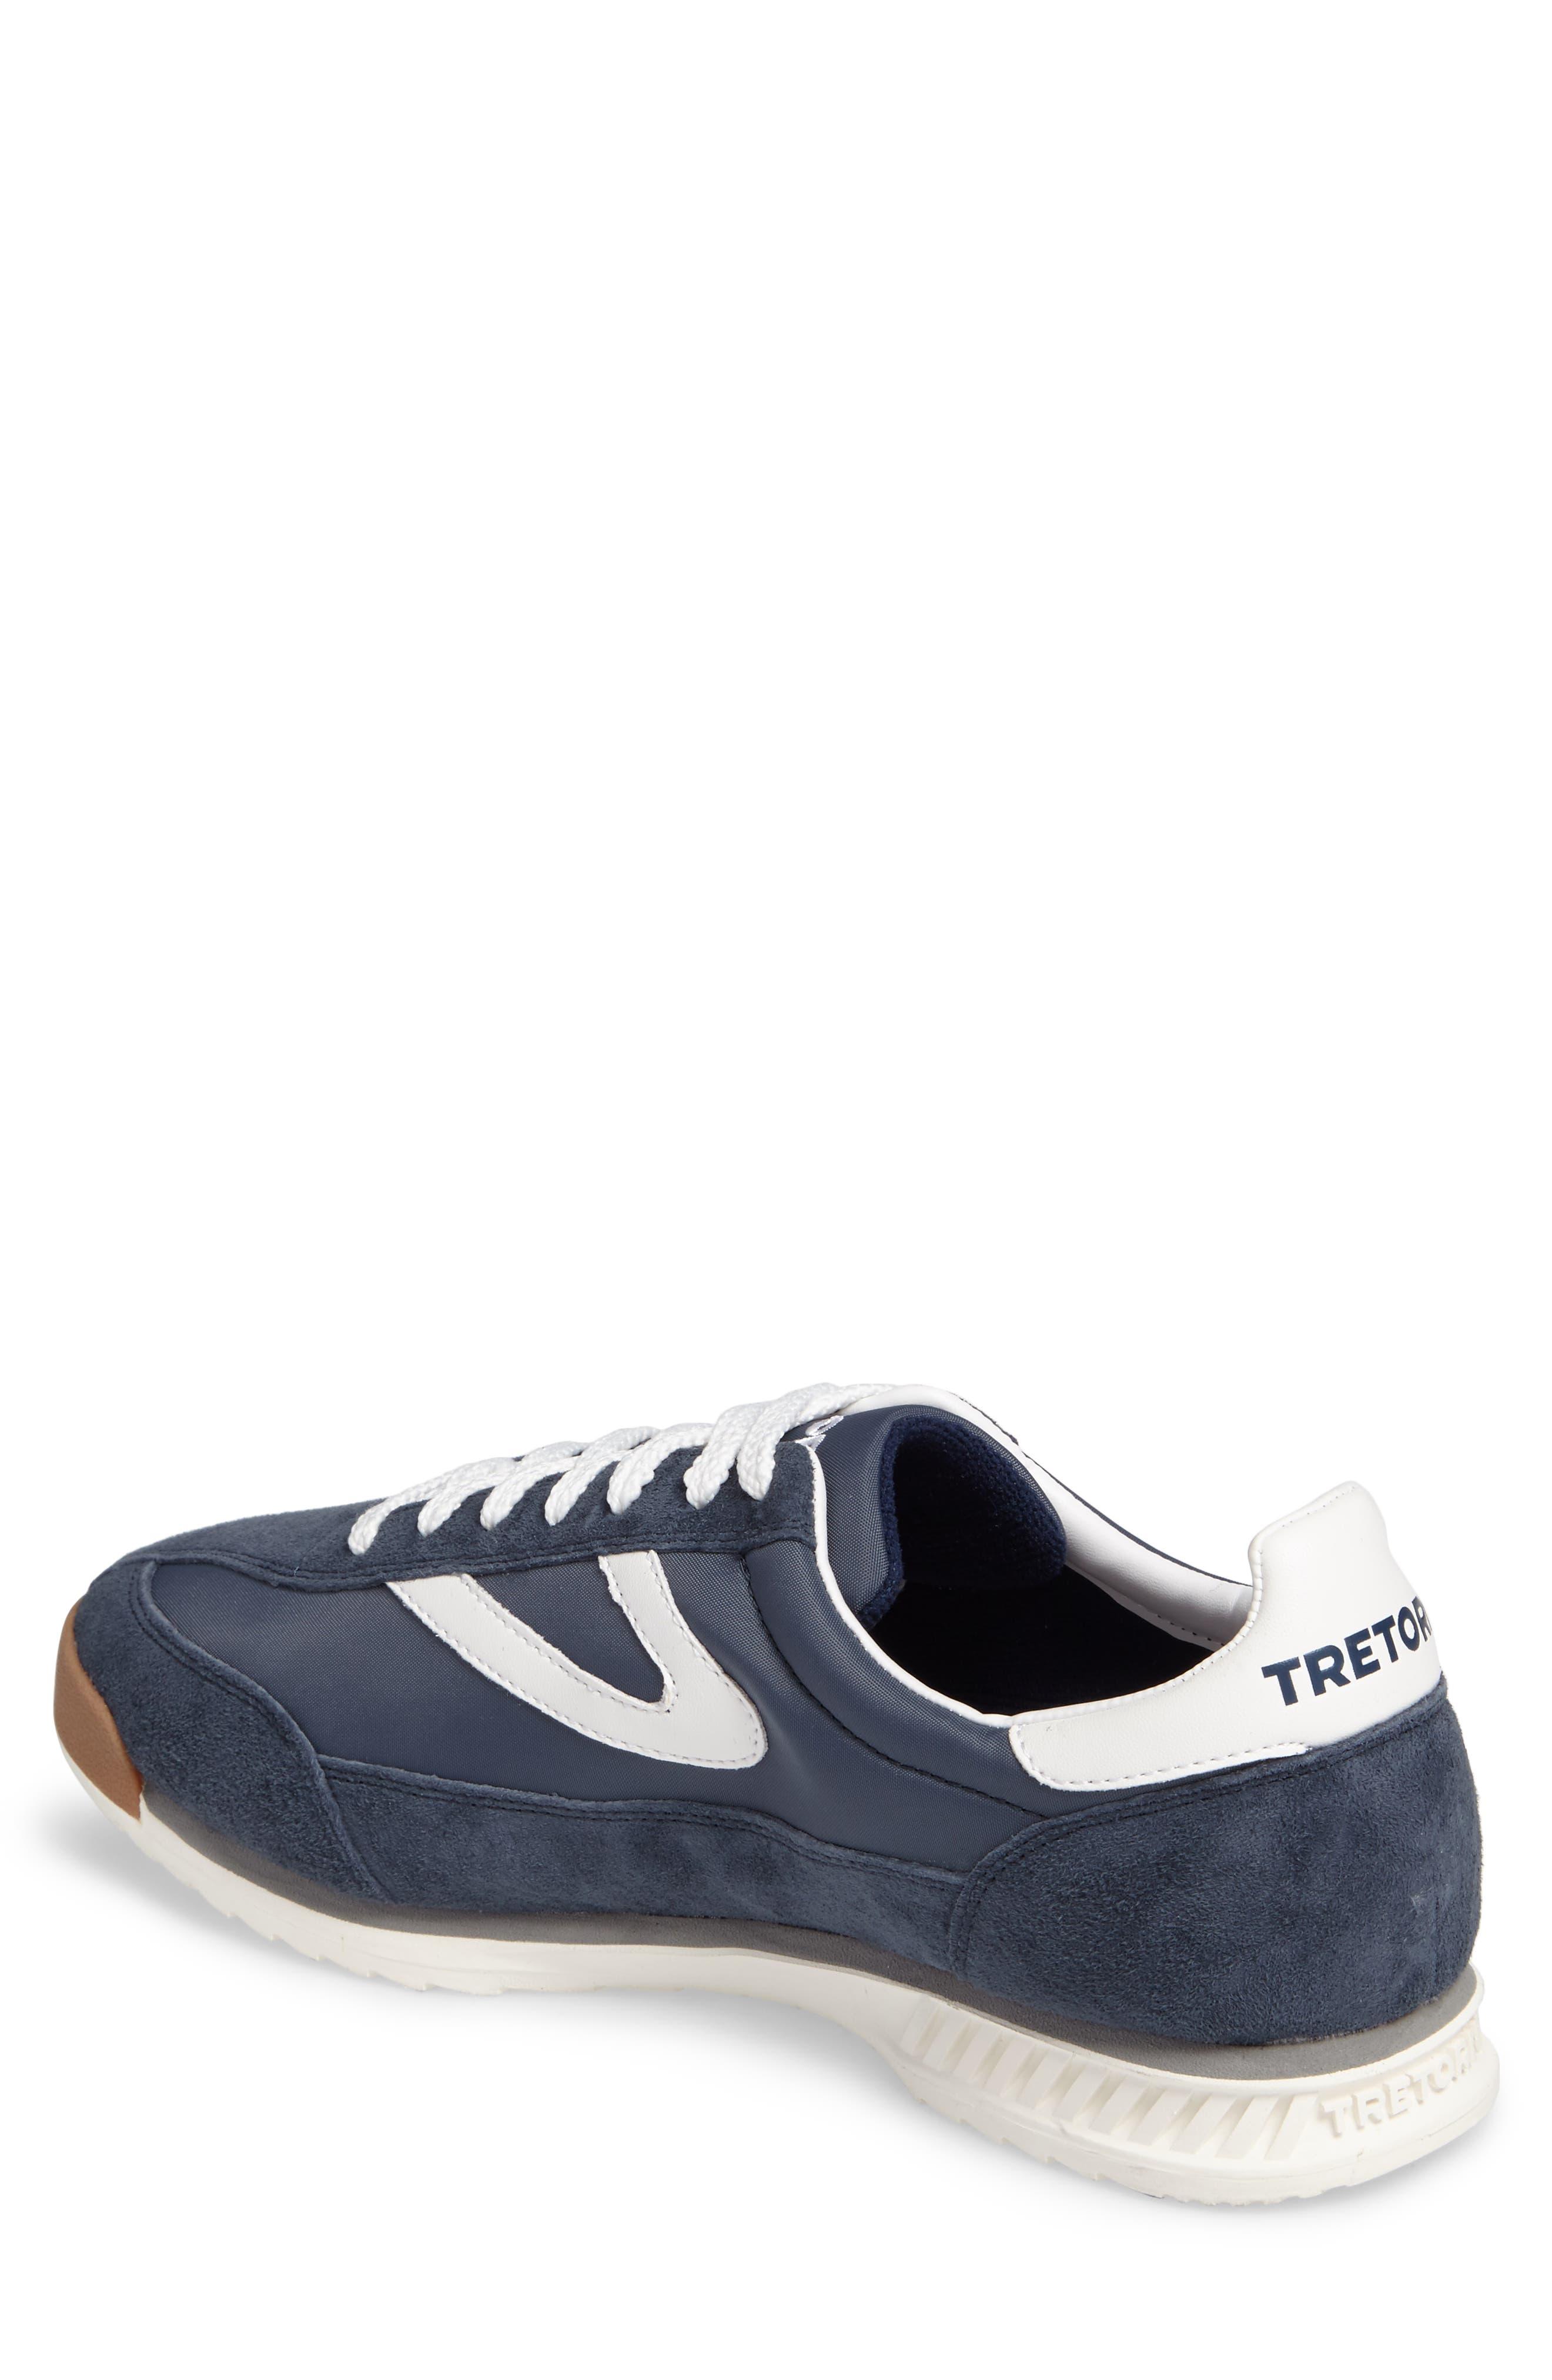 Rawlins 3 Sneaker,                             Alternate thumbnail 2, color,                             Blue/ Blue/ White